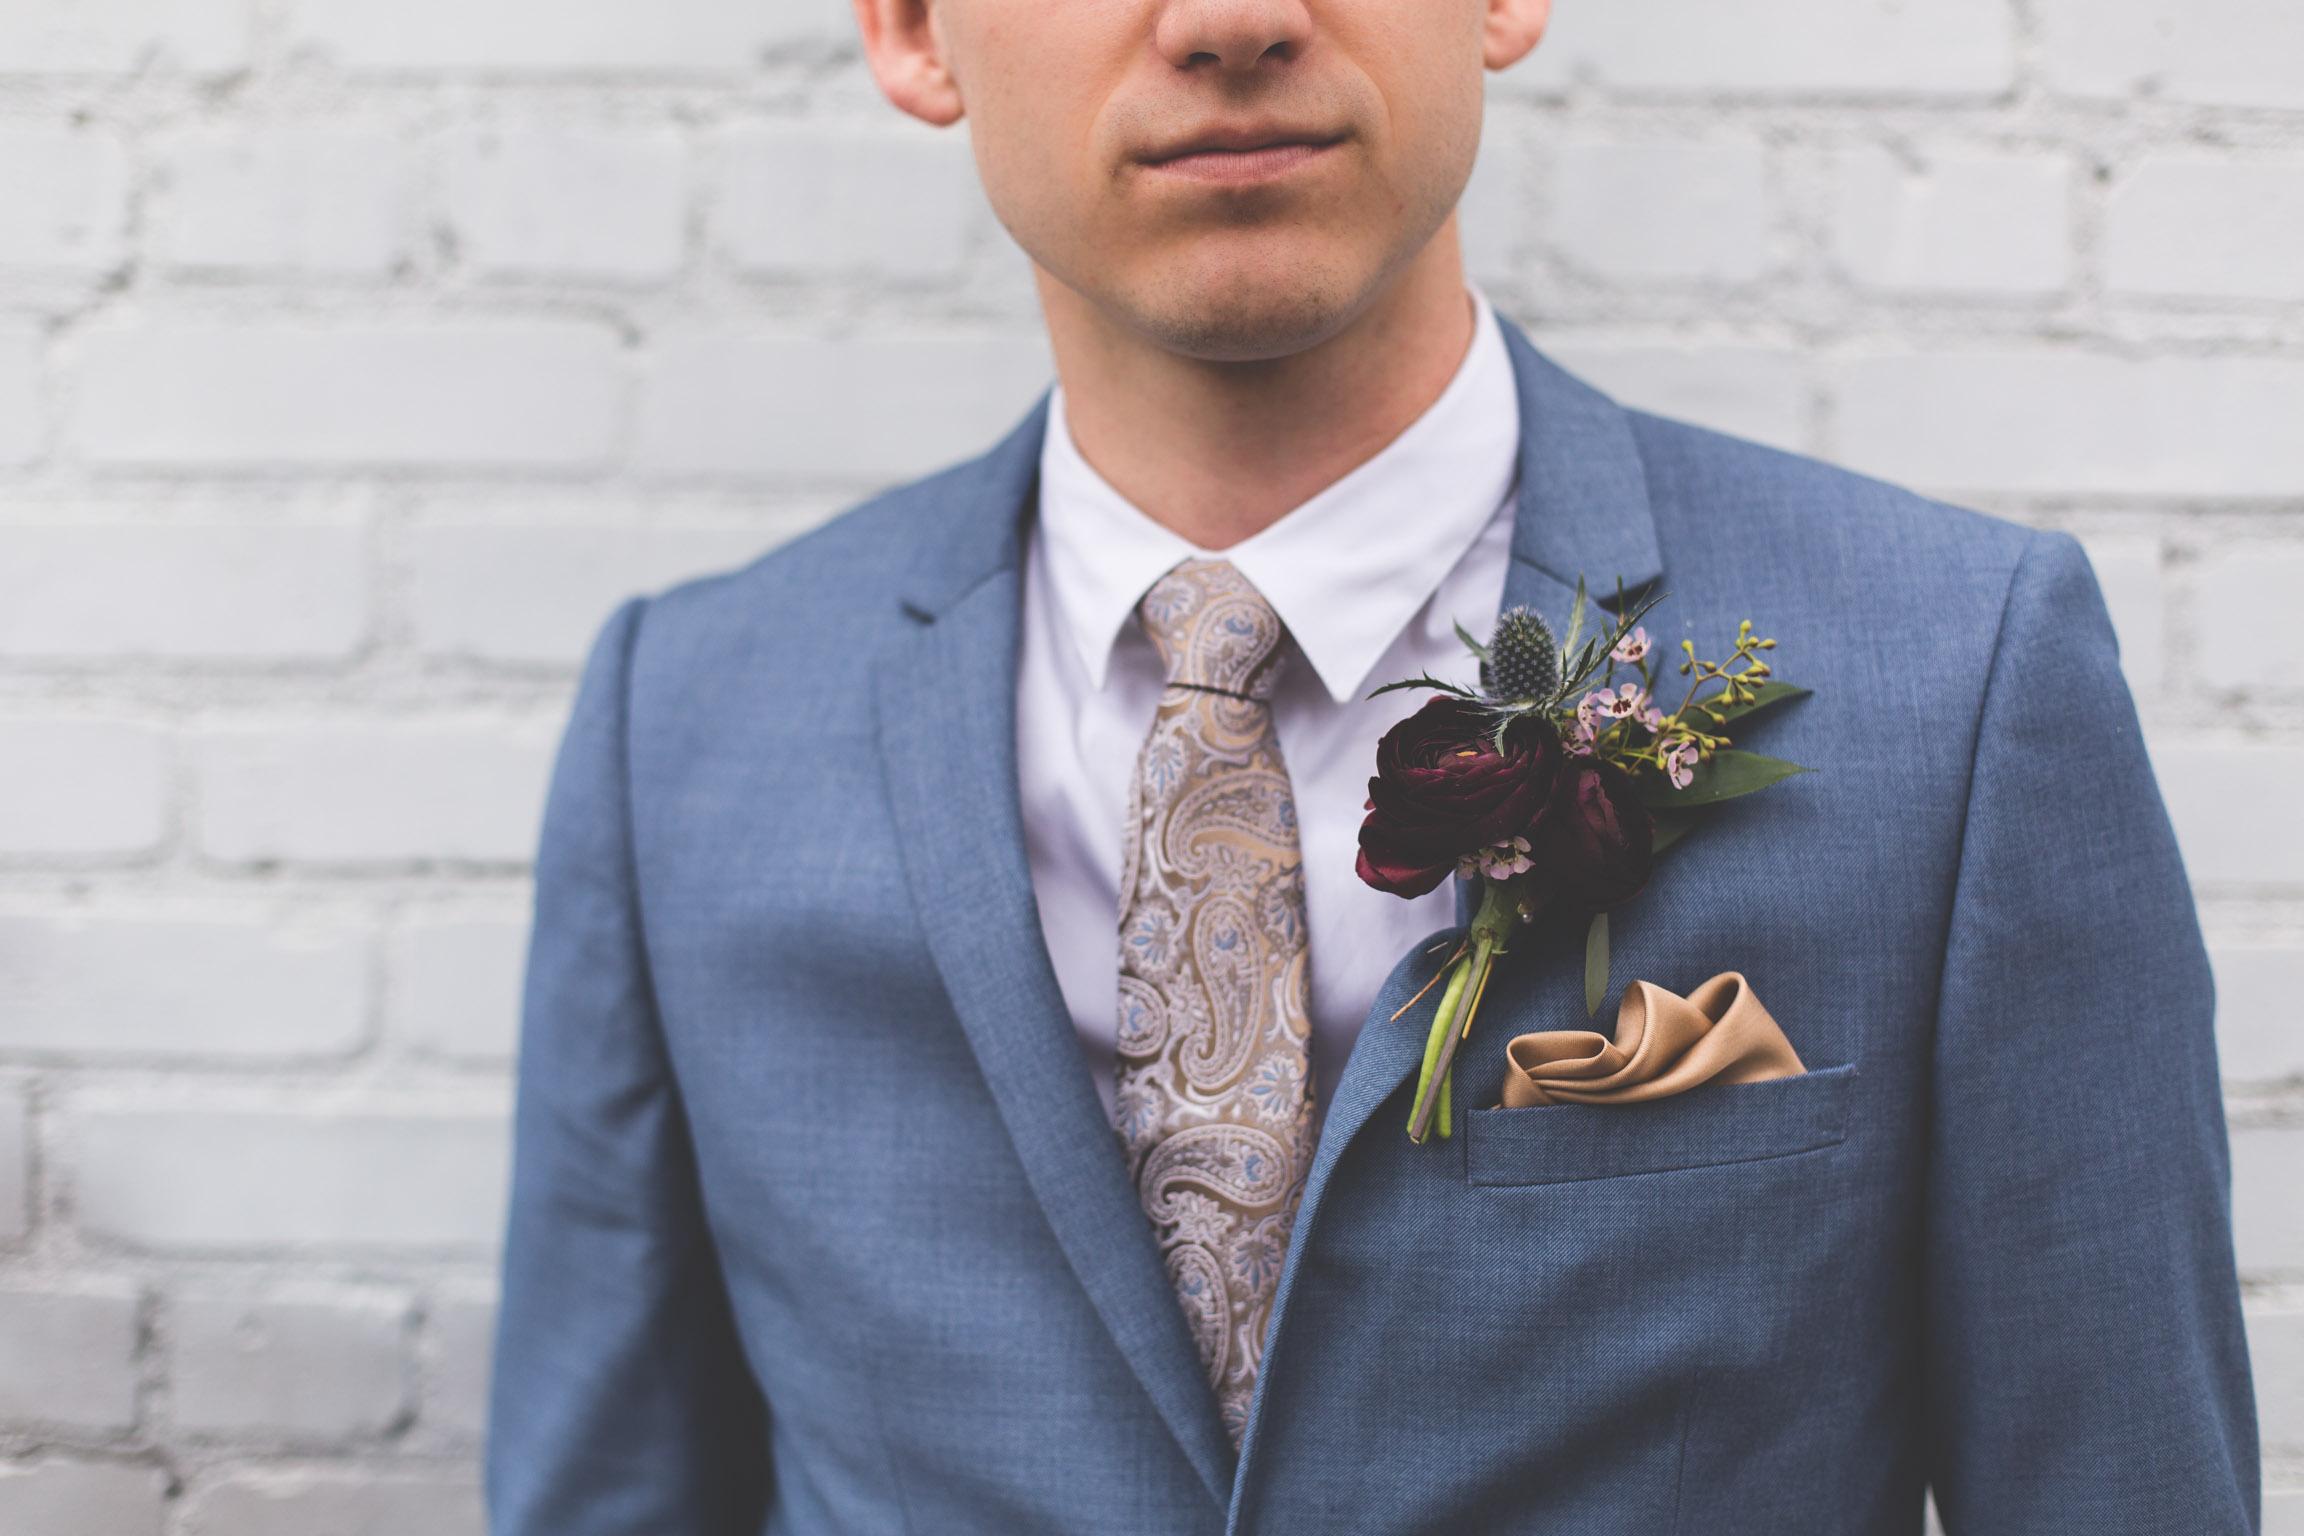 Adam-Szrmack-The-Glass-Factory-Wedding-55.jpg